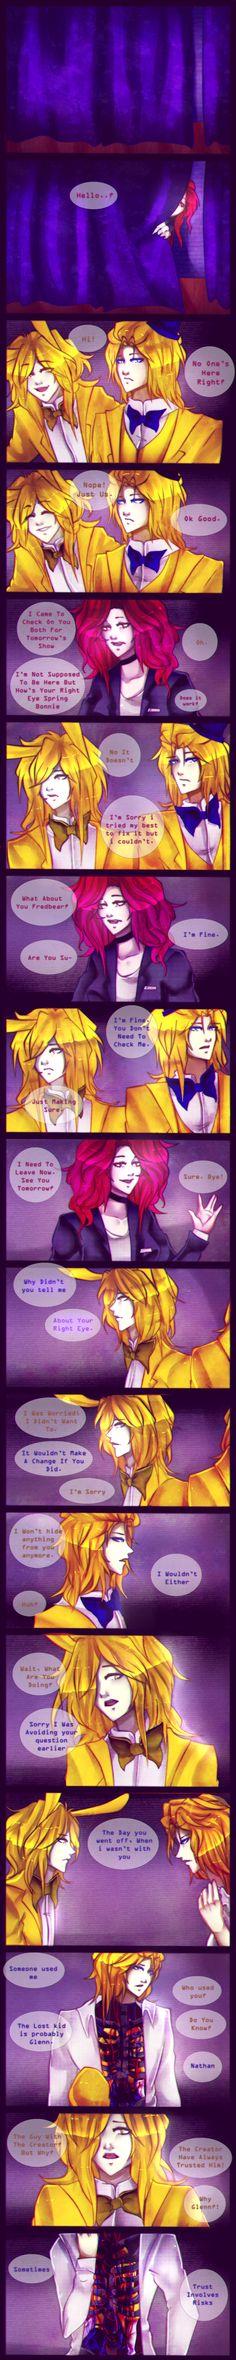 .: Lost [FNaF AU Comic] Page 5 :. by Ailurophile-Chan on DeviantArt